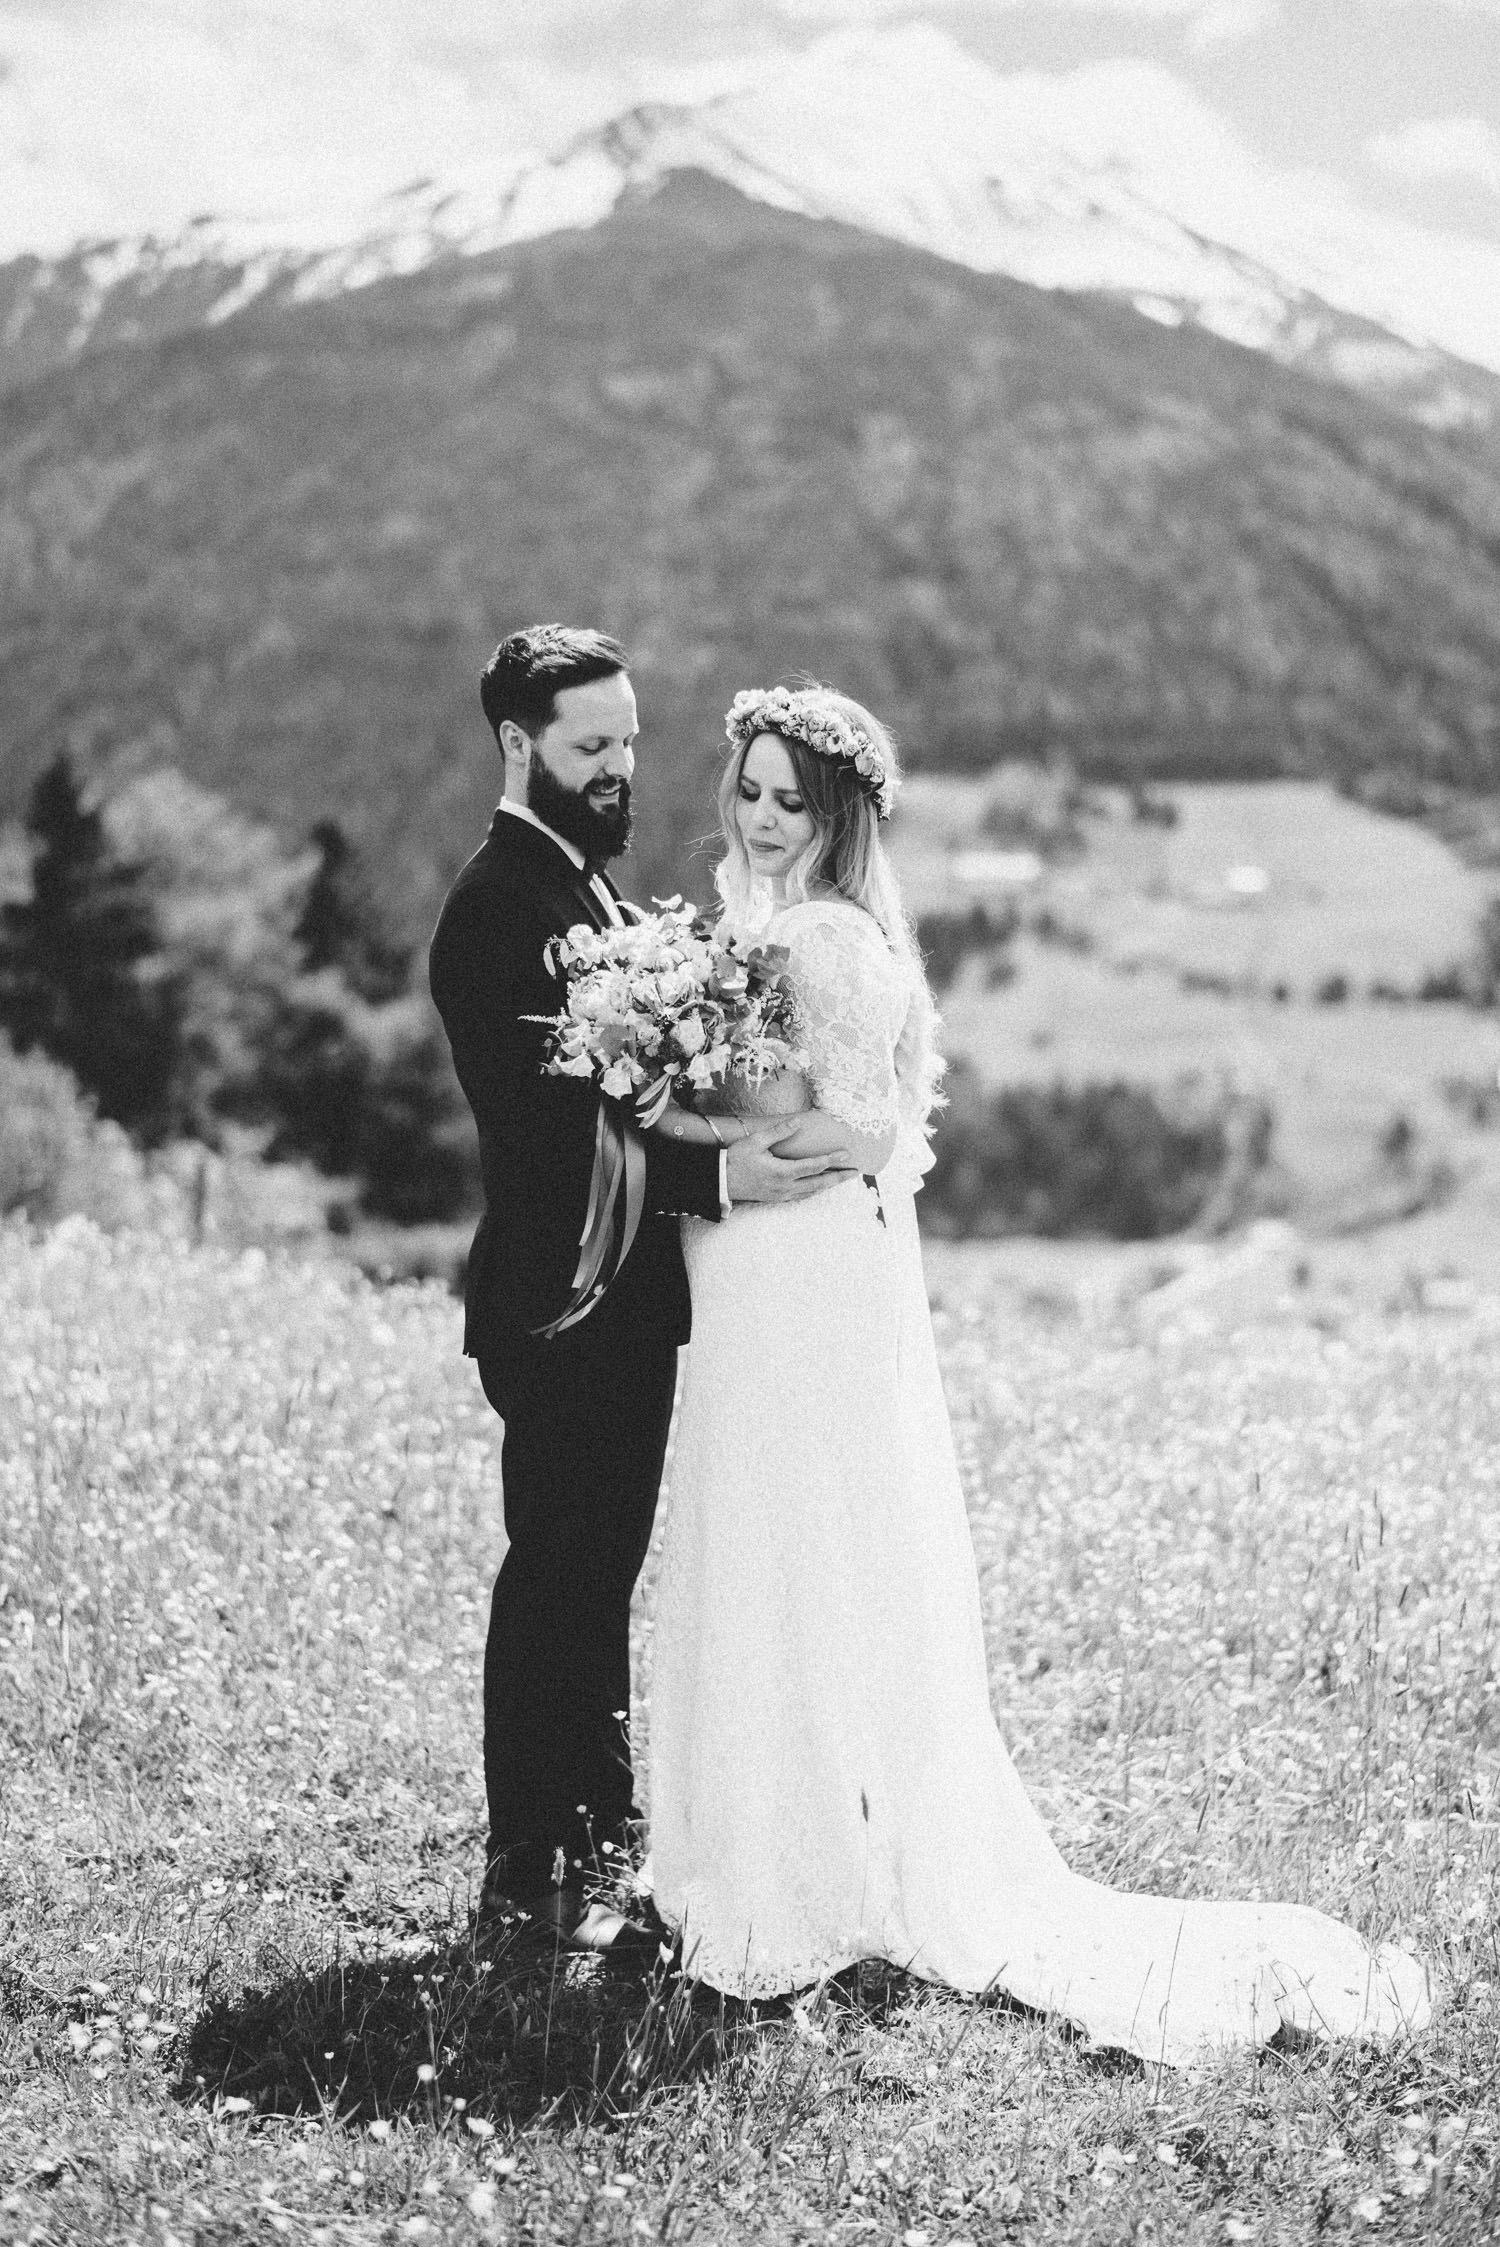 hochzeit-schloss-mittersill-heiraten-in-den-bergen-hochzeitsfotografin-mariagadringer-039.jpg